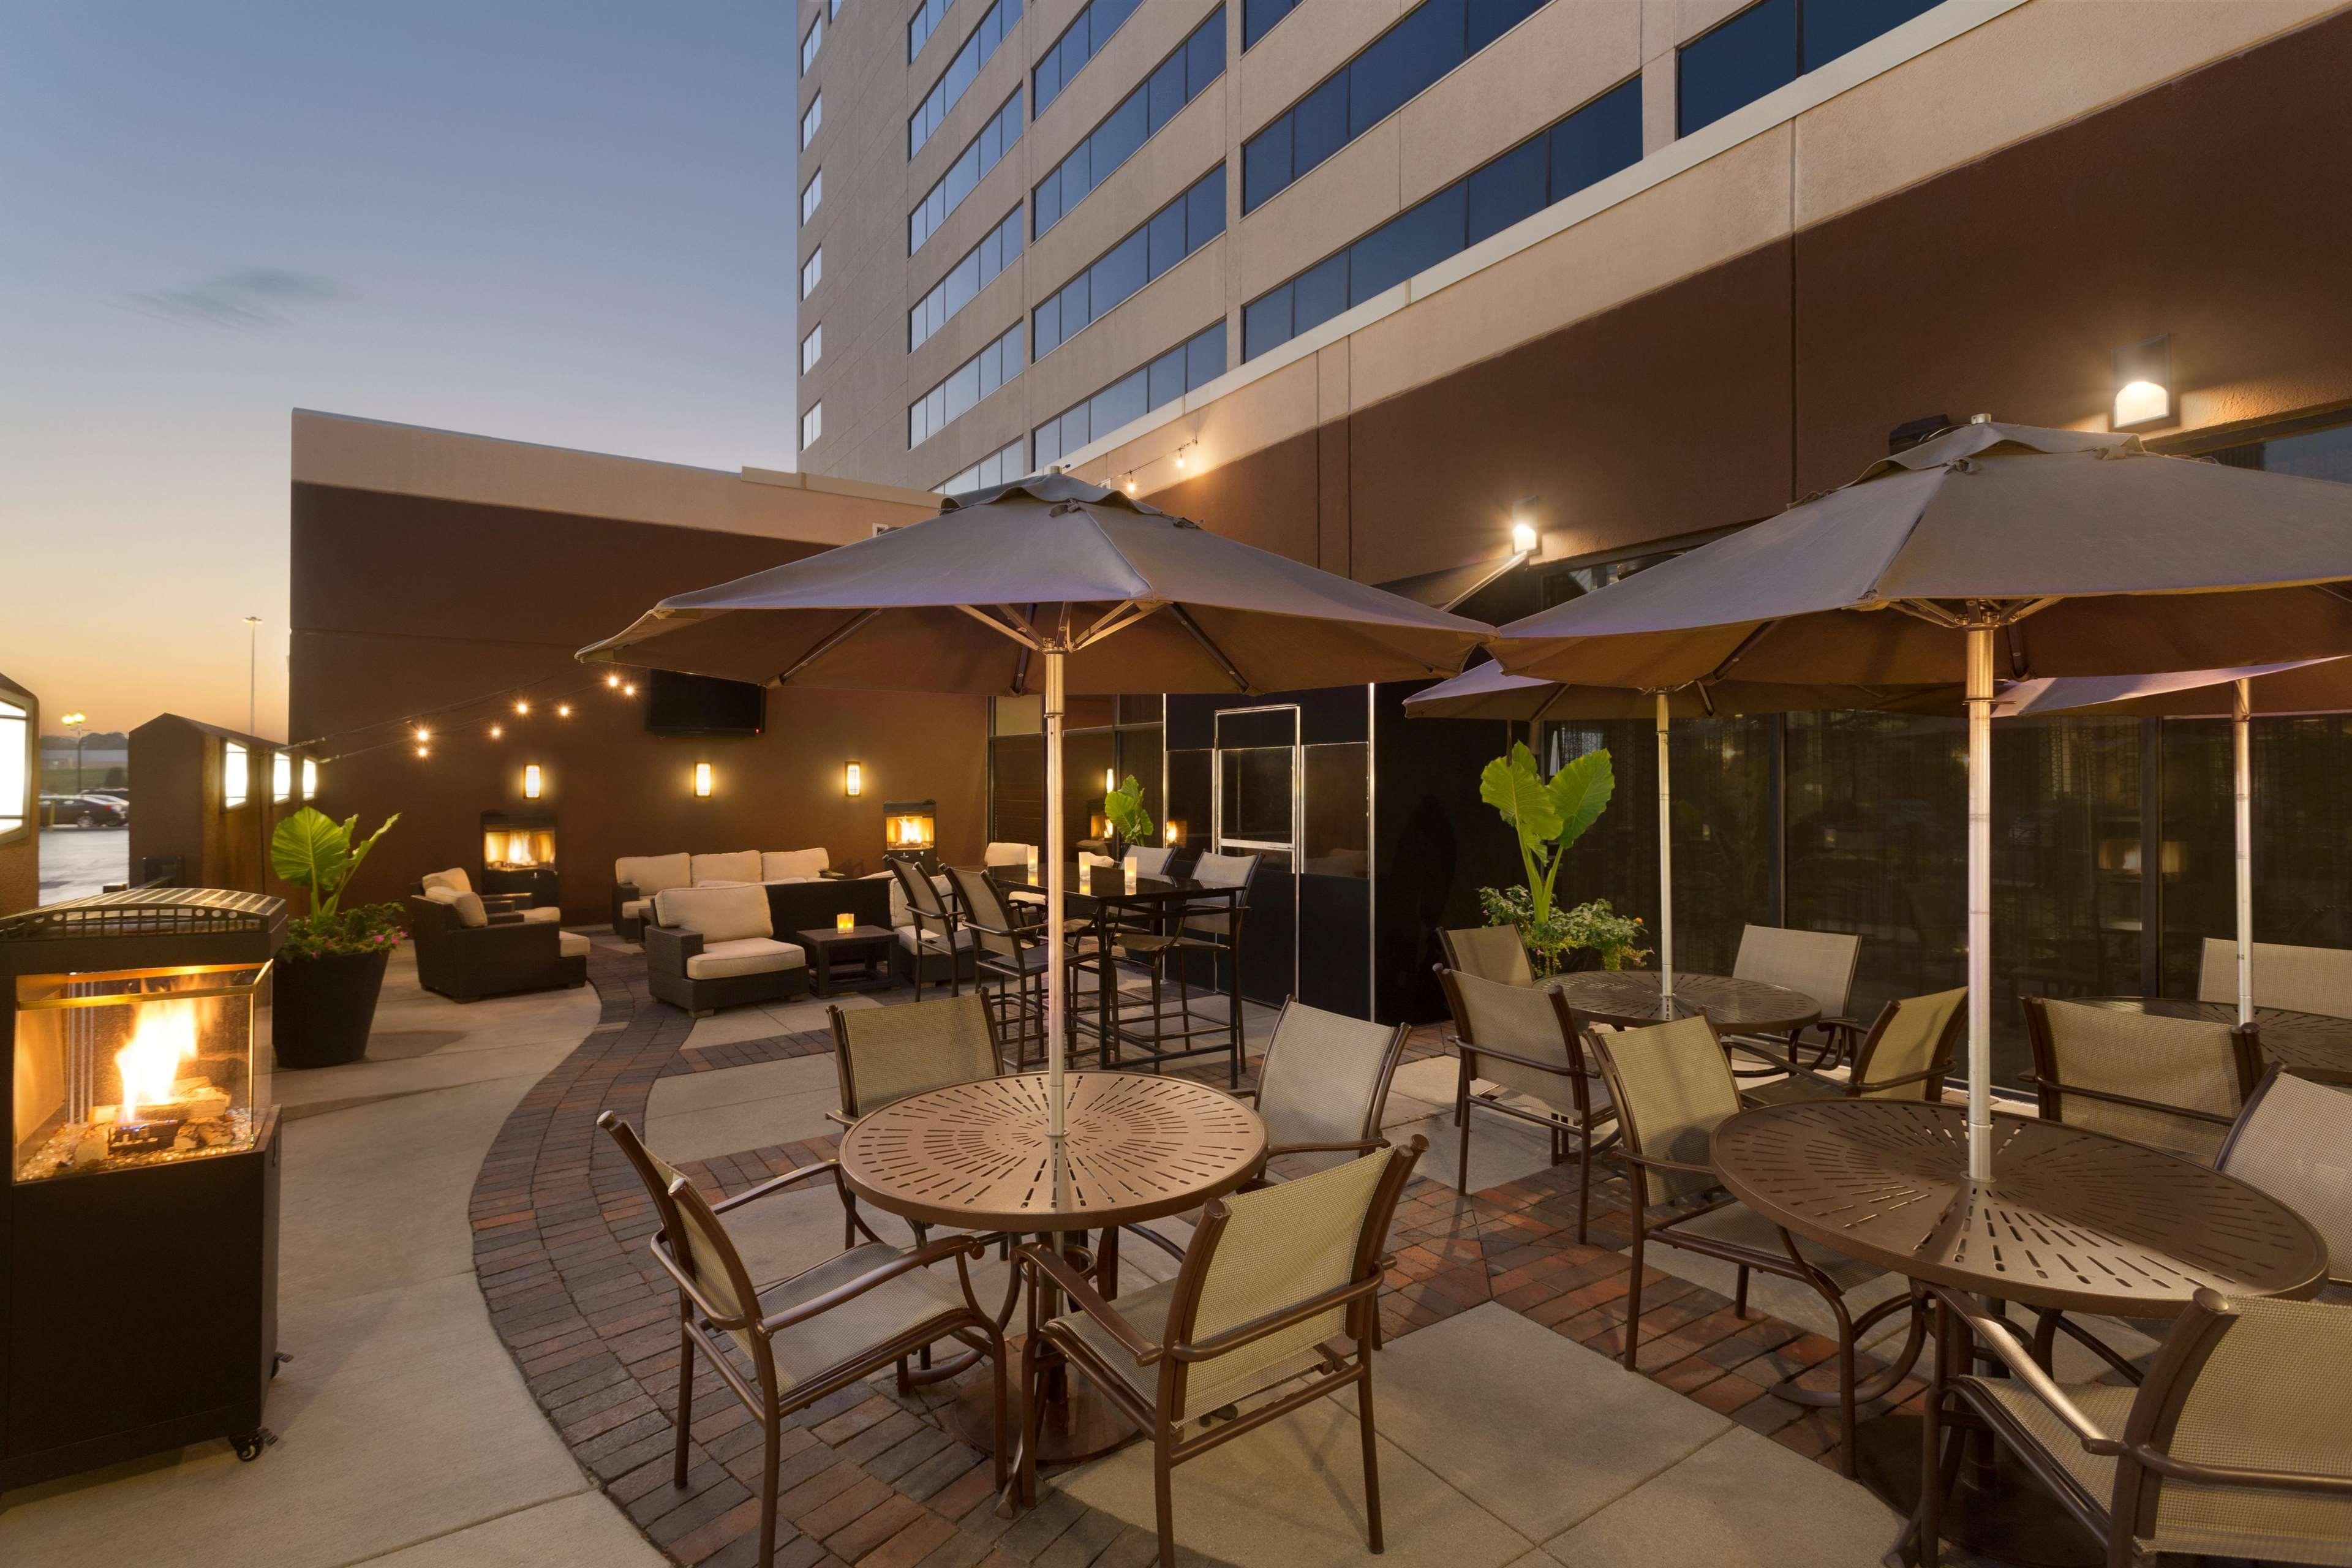 Hilton chicago oak brook suites oakbrook terrace illinois - Hilton garden inn oakbrook terrace ...